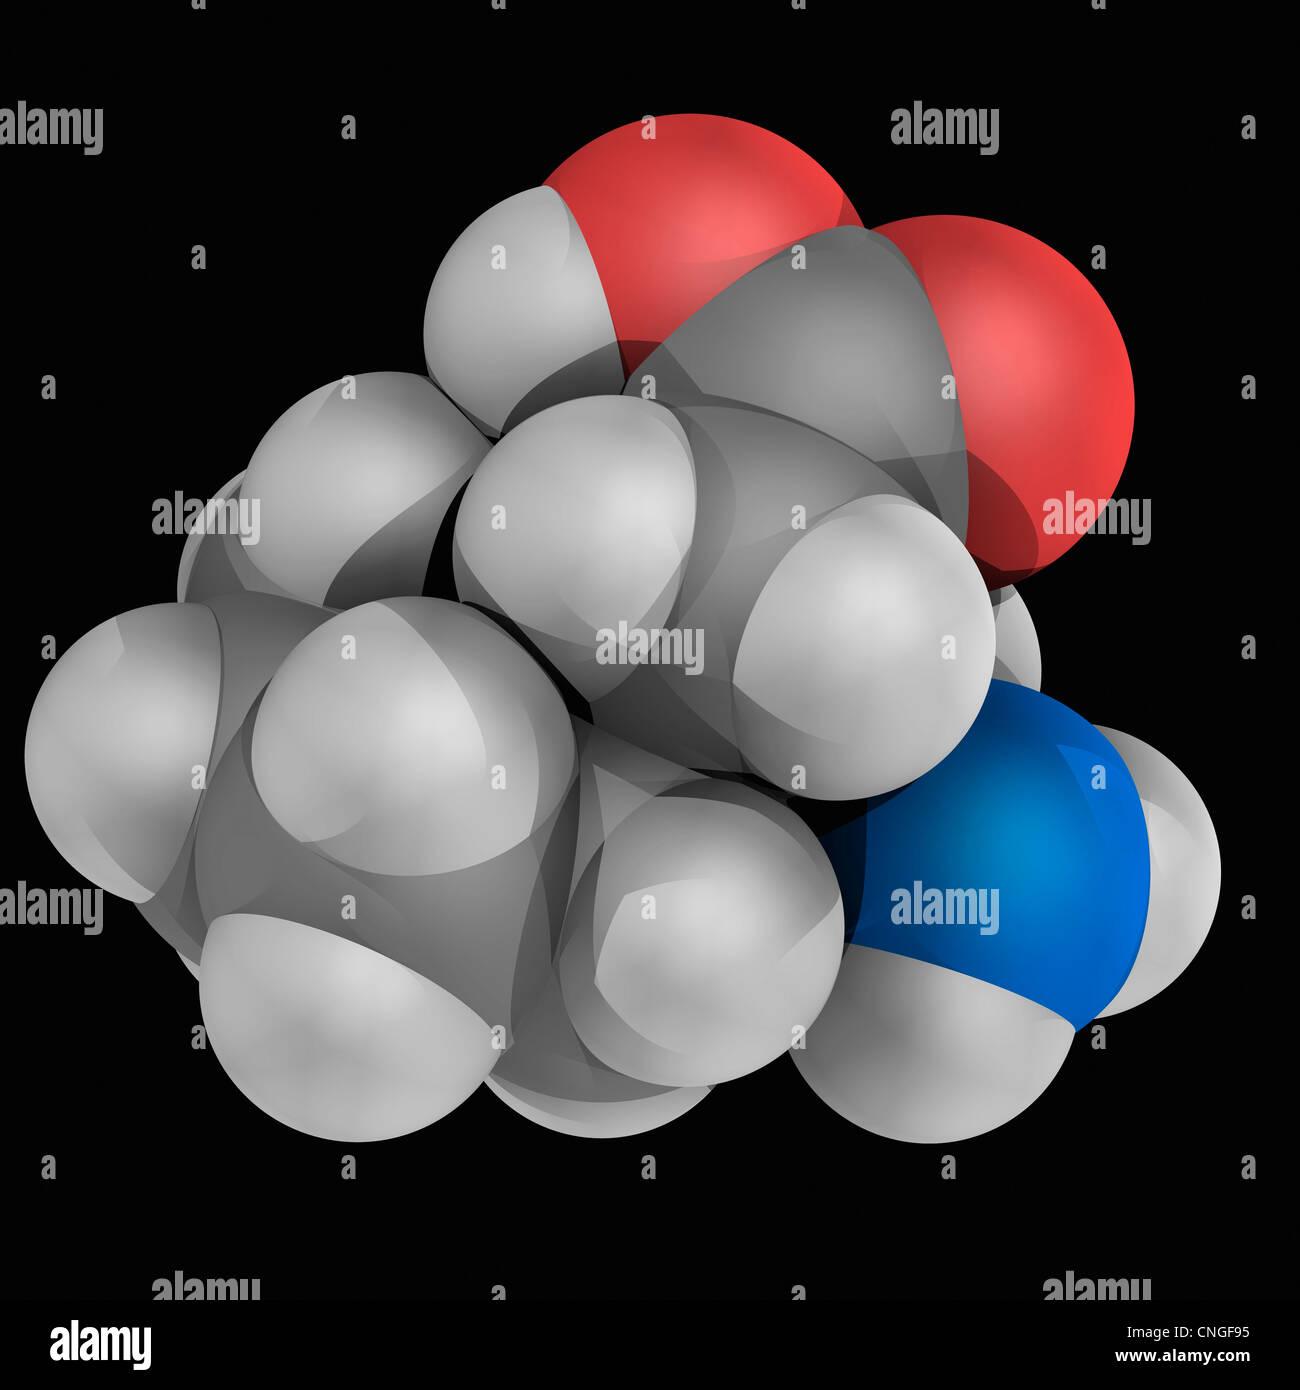 Gabapentin drug molecule - Stock Image